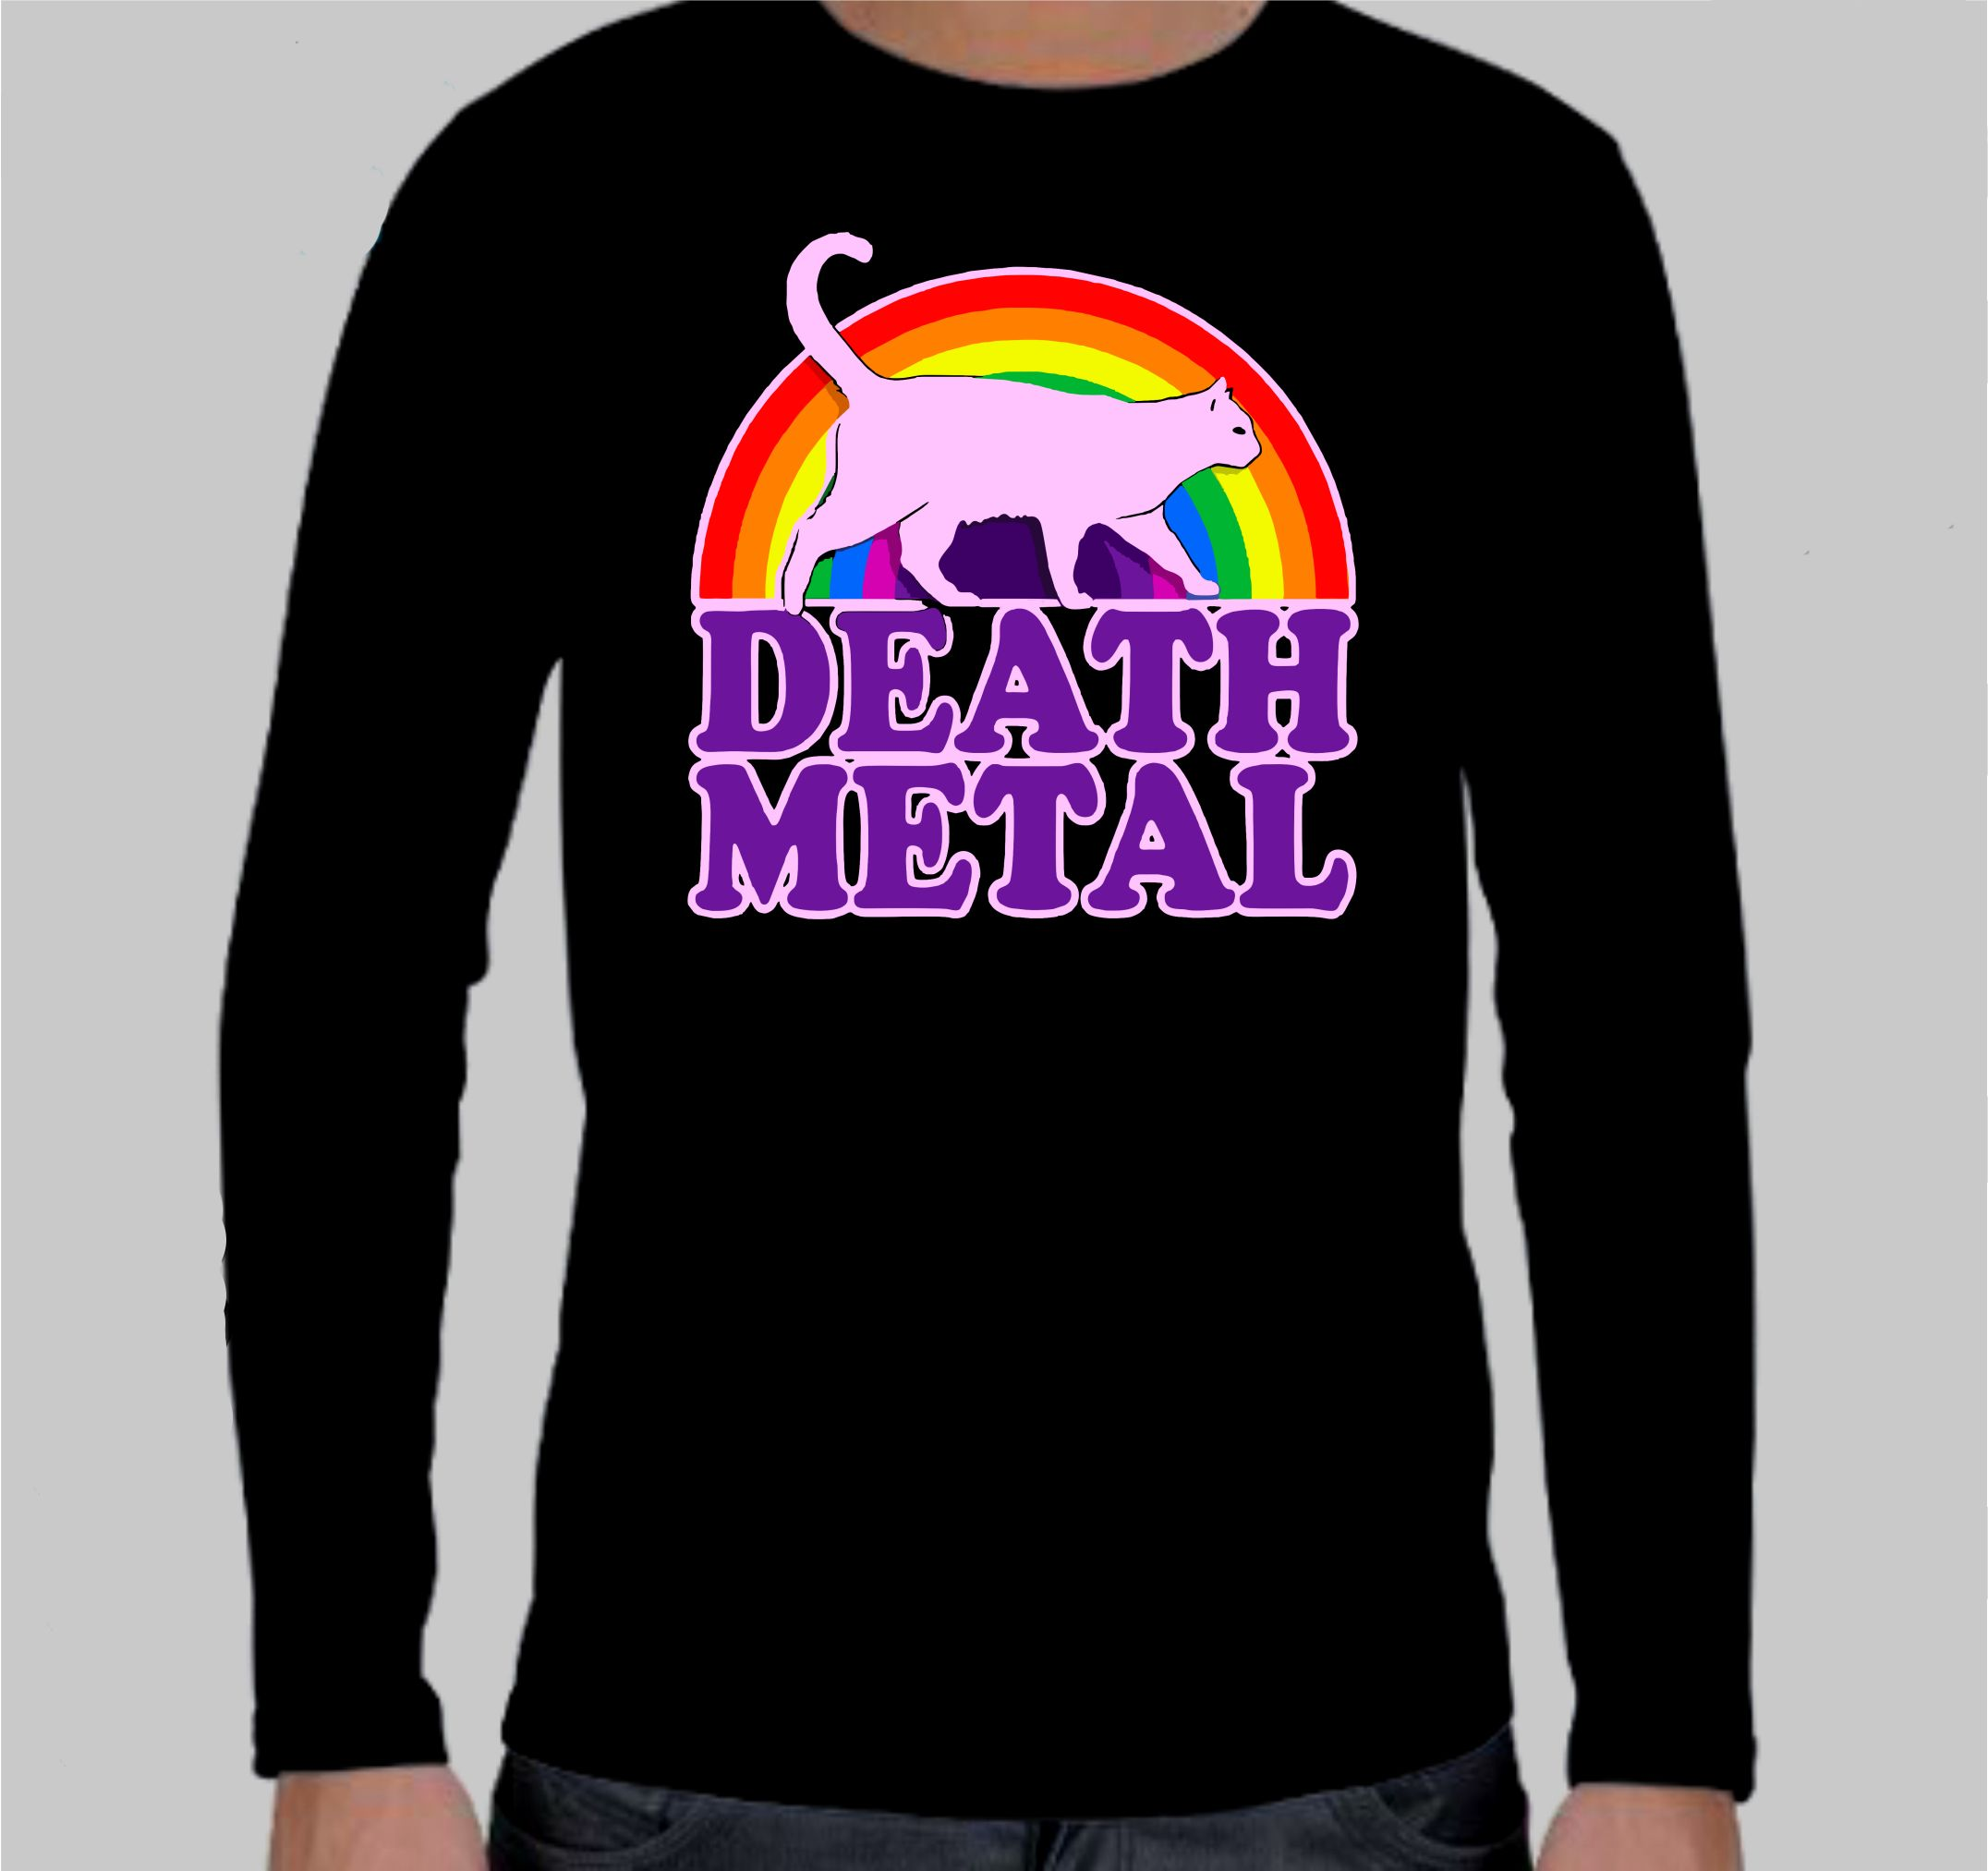 death metal cat longsleeve t shirt metal rock t shirts and accessories. Black Bedroom Furniture Sets. Home Design Ideas